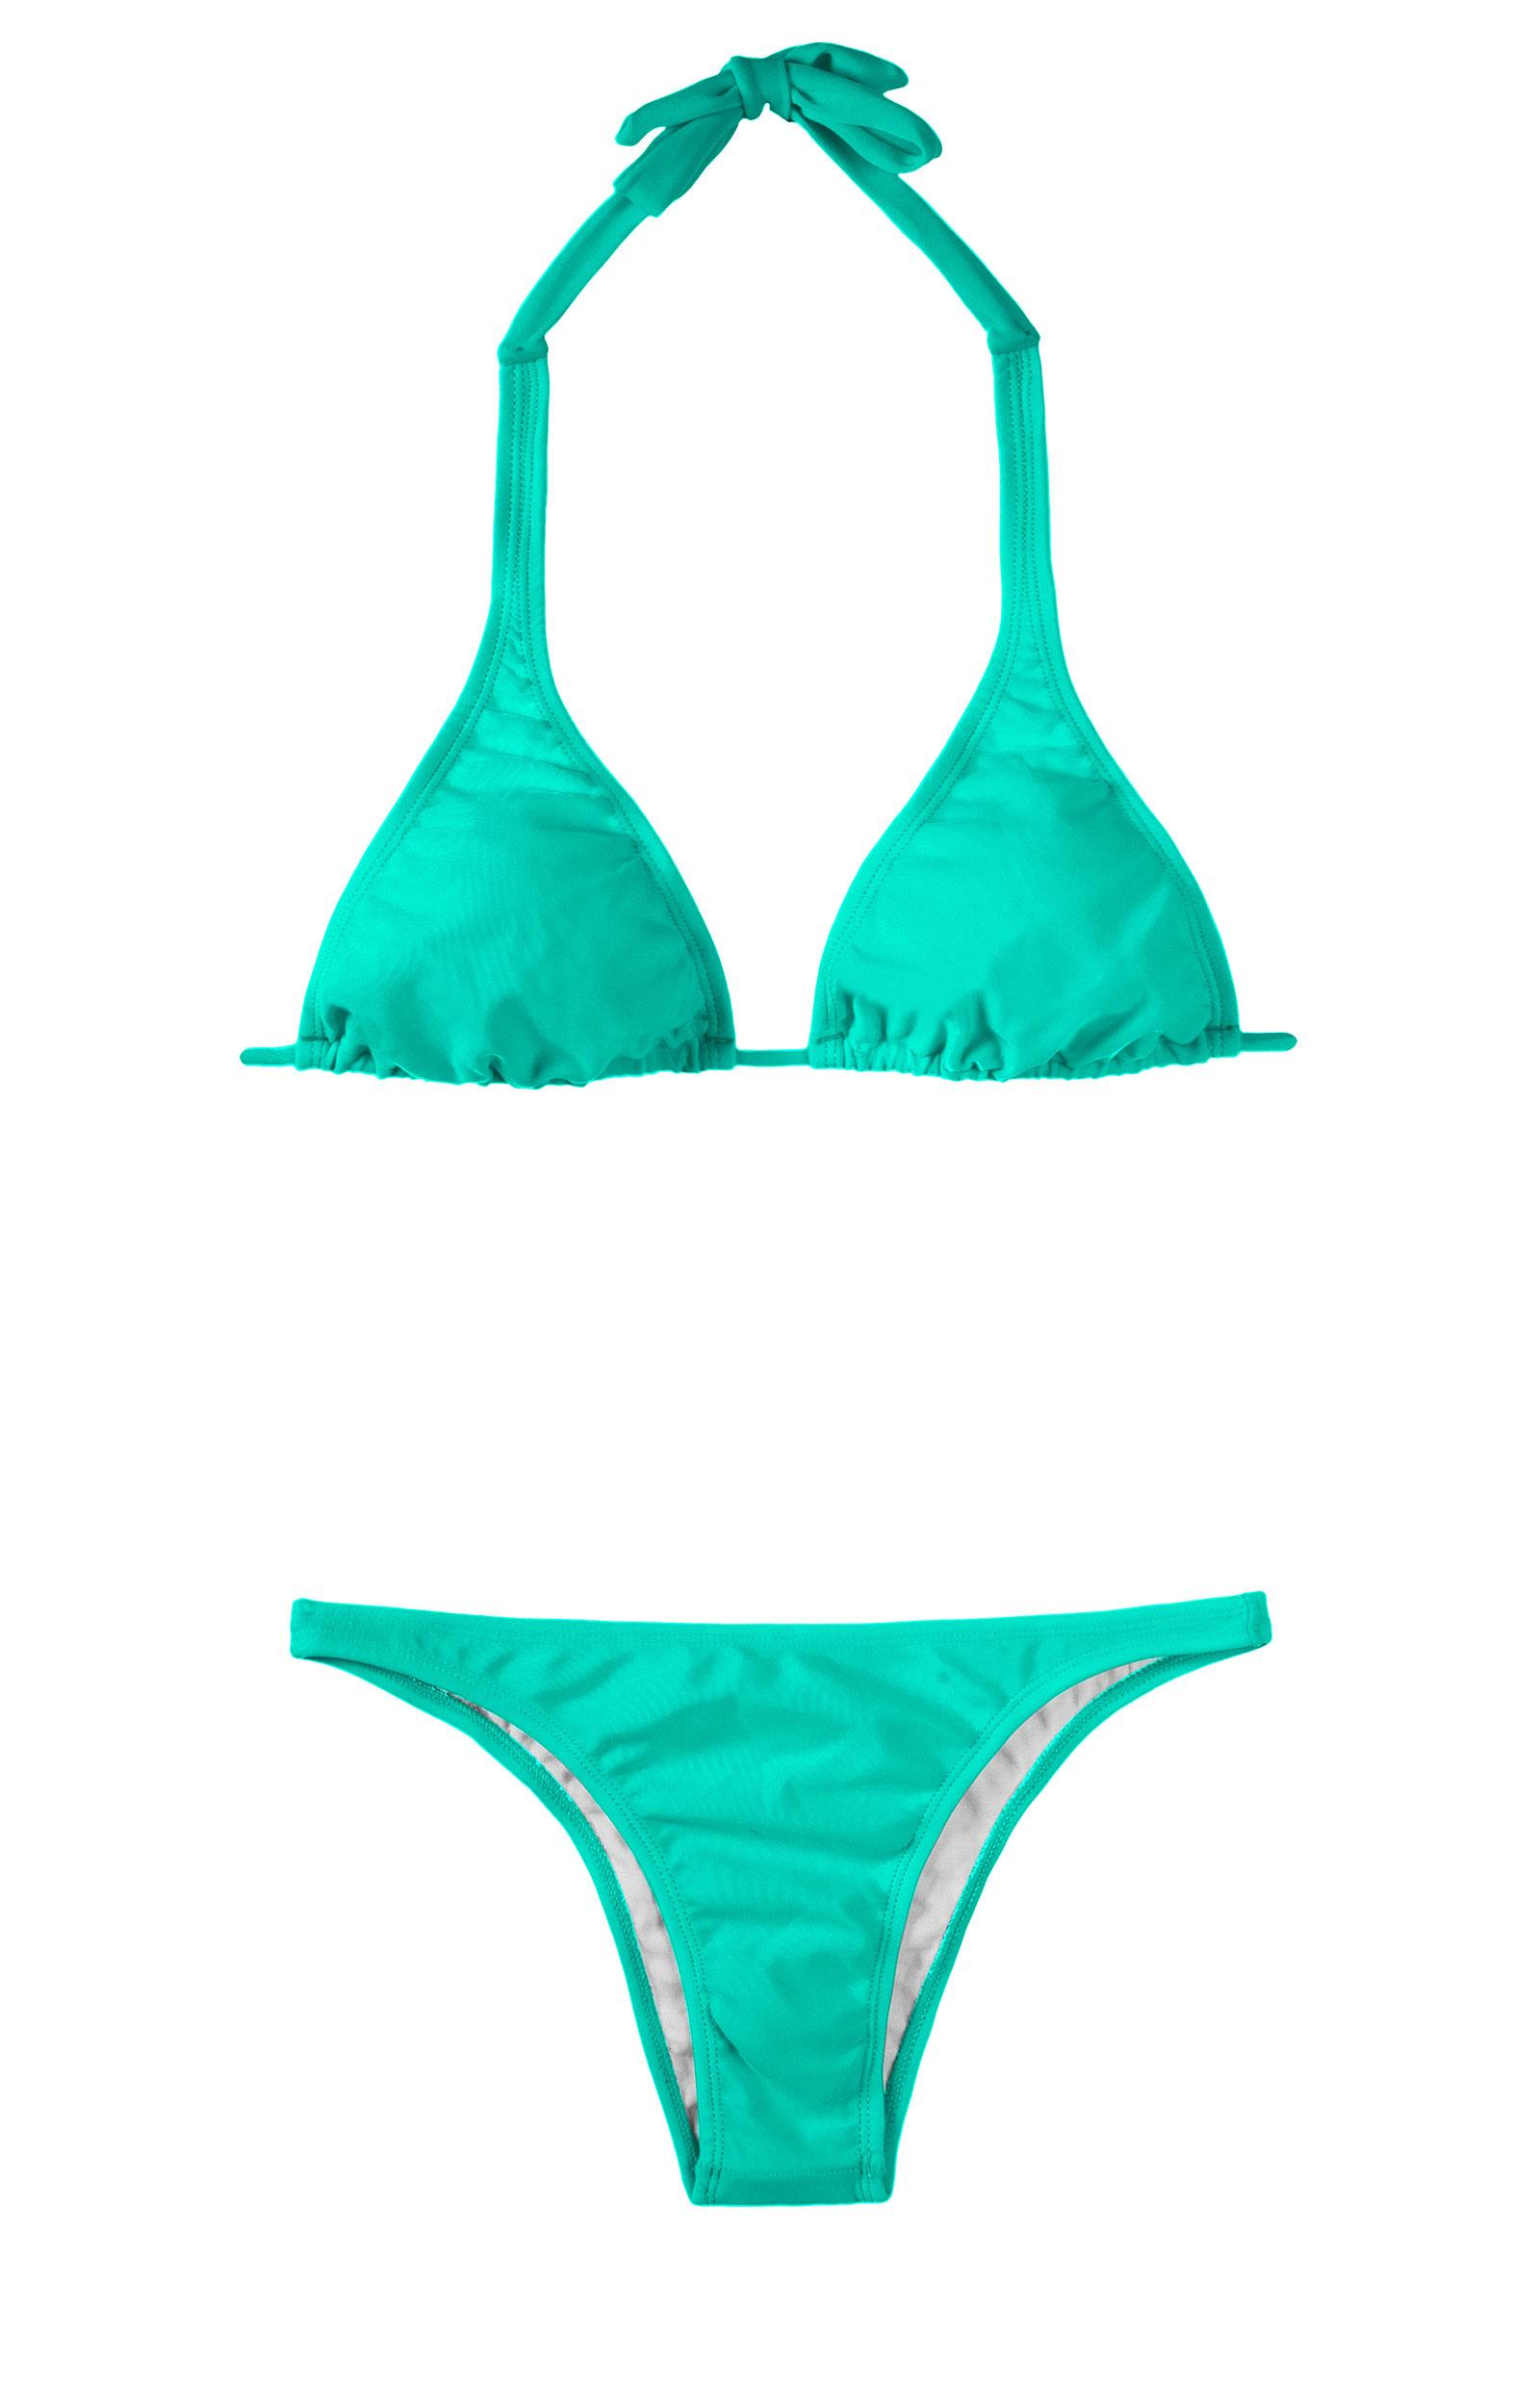 Triangle-bikini, Schalförmiger Schnitt, Farbe: Lagunengrün - Mare Cortinao  Basic